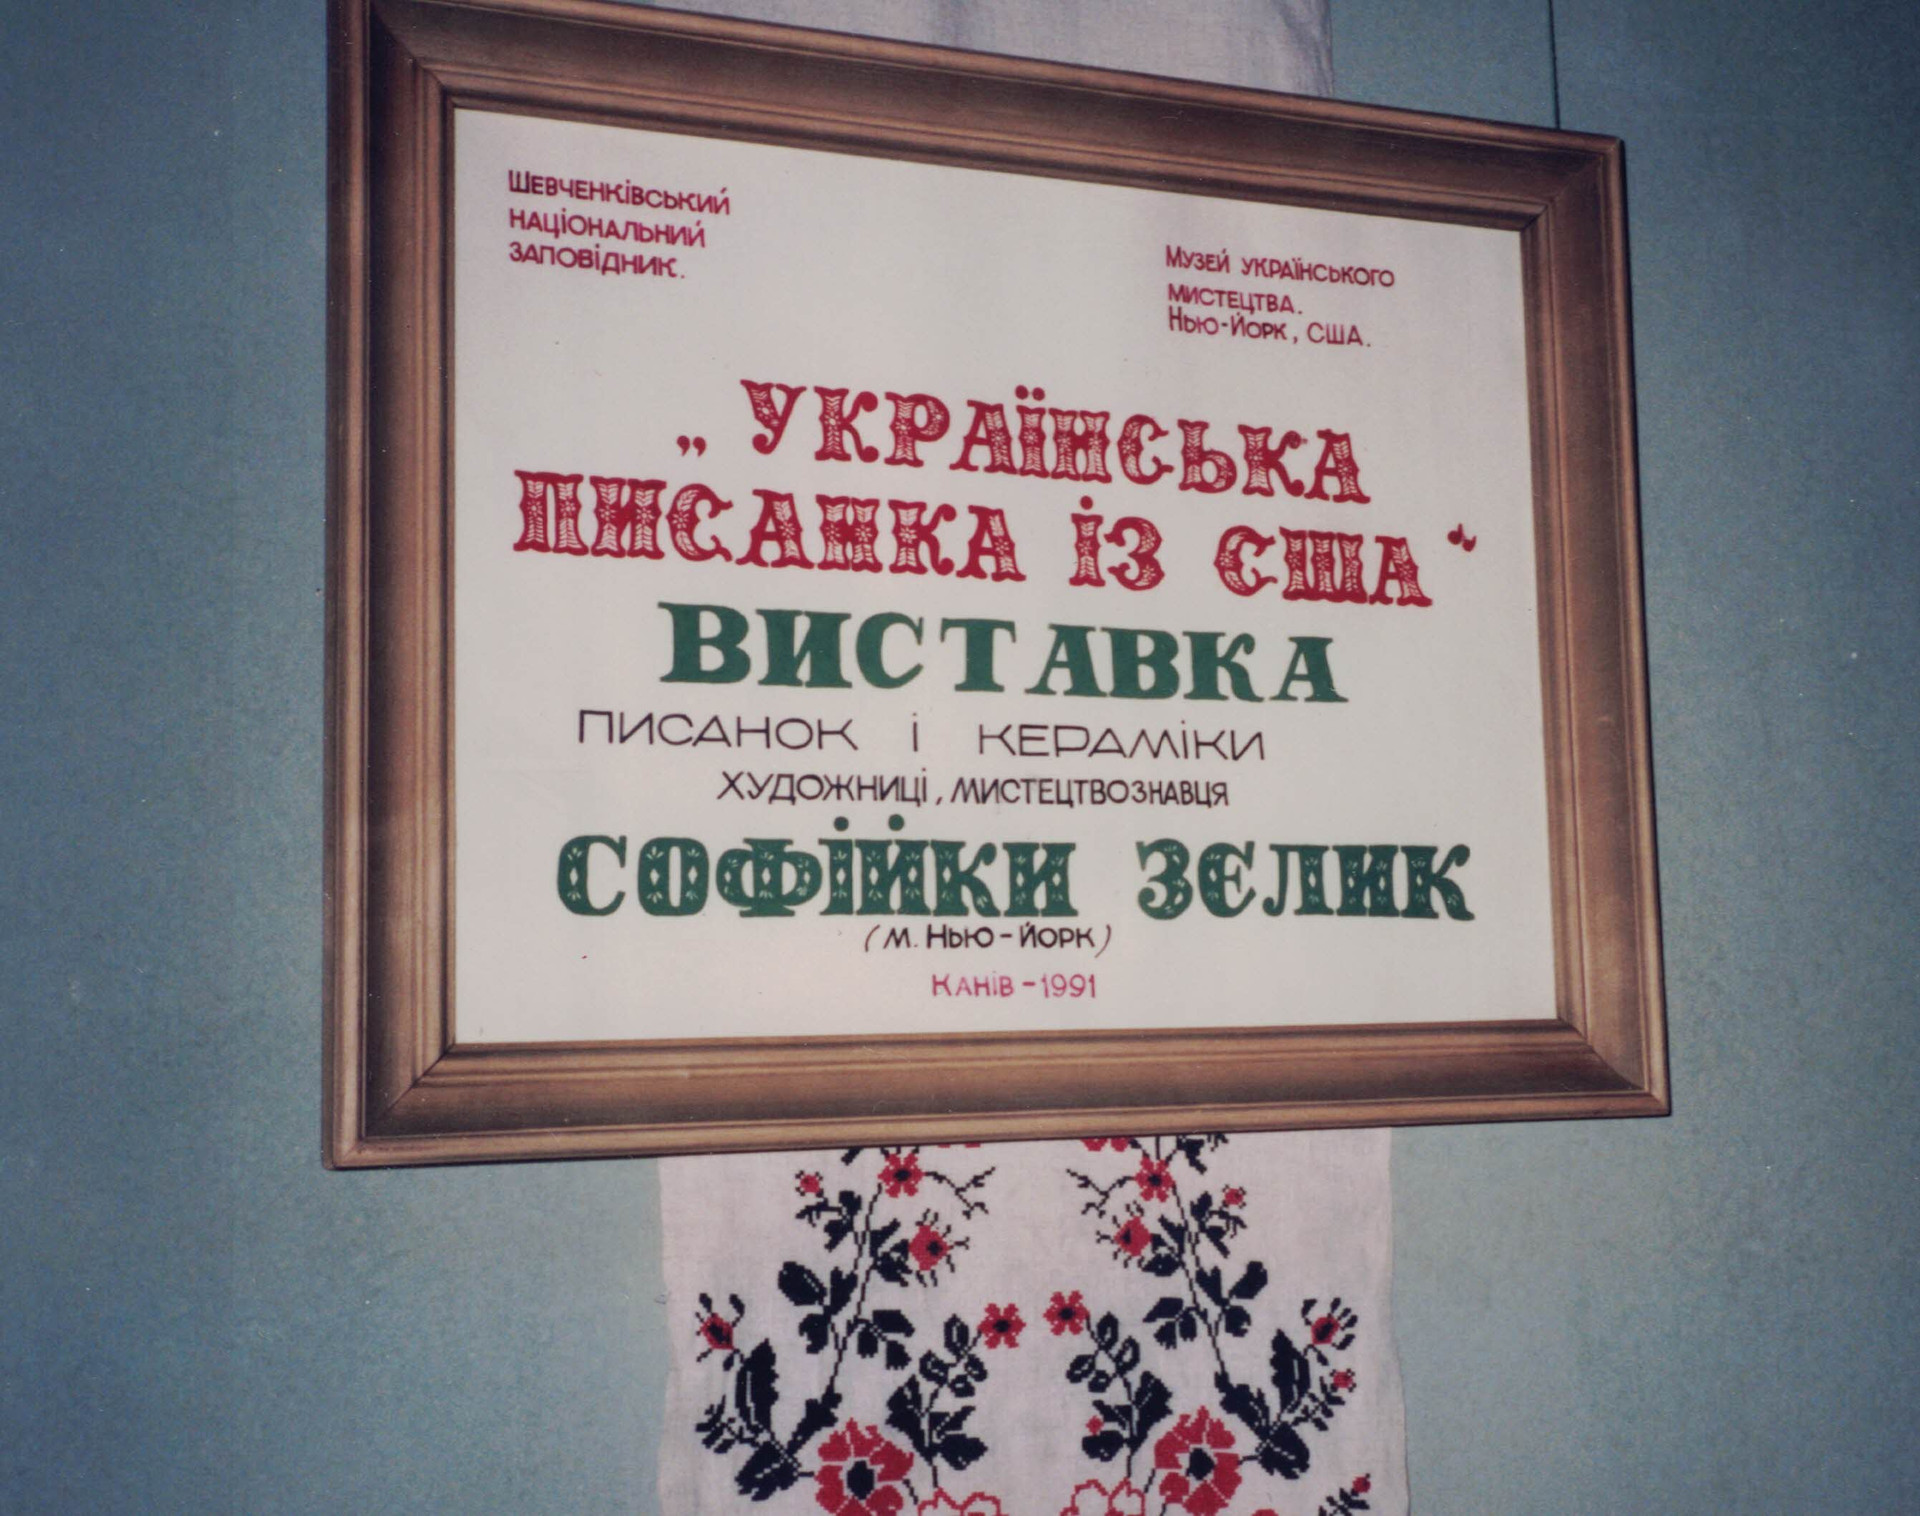 Poster announcing my pysanka and ceramics exhibit in the city of Kaniv, Ukraine